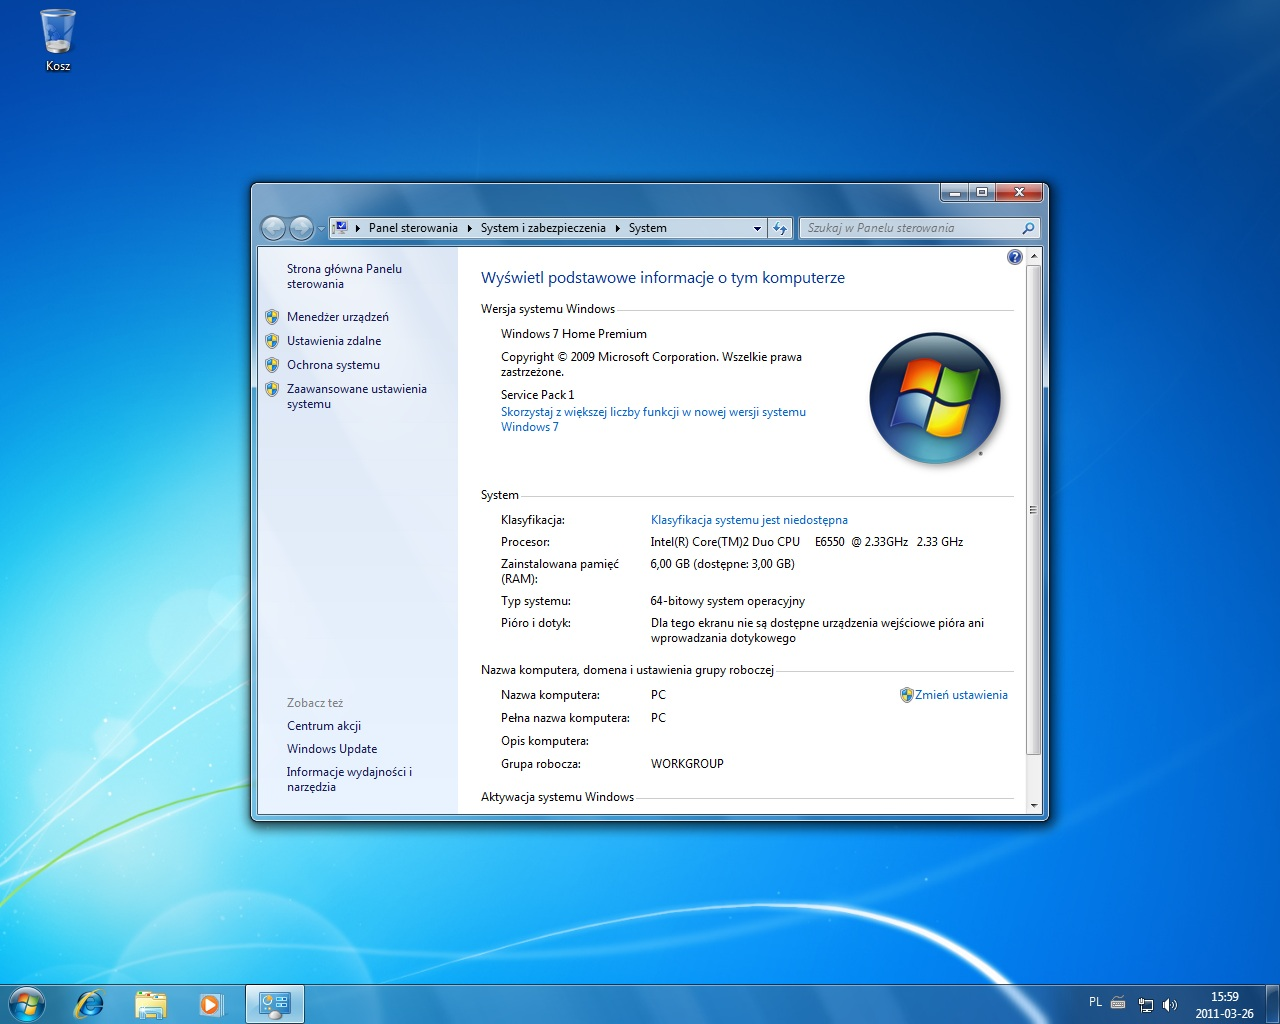 Brak pe�nej dost�pno�ci pami�ci RAM w win7 x64 [6GB/3,5GB]